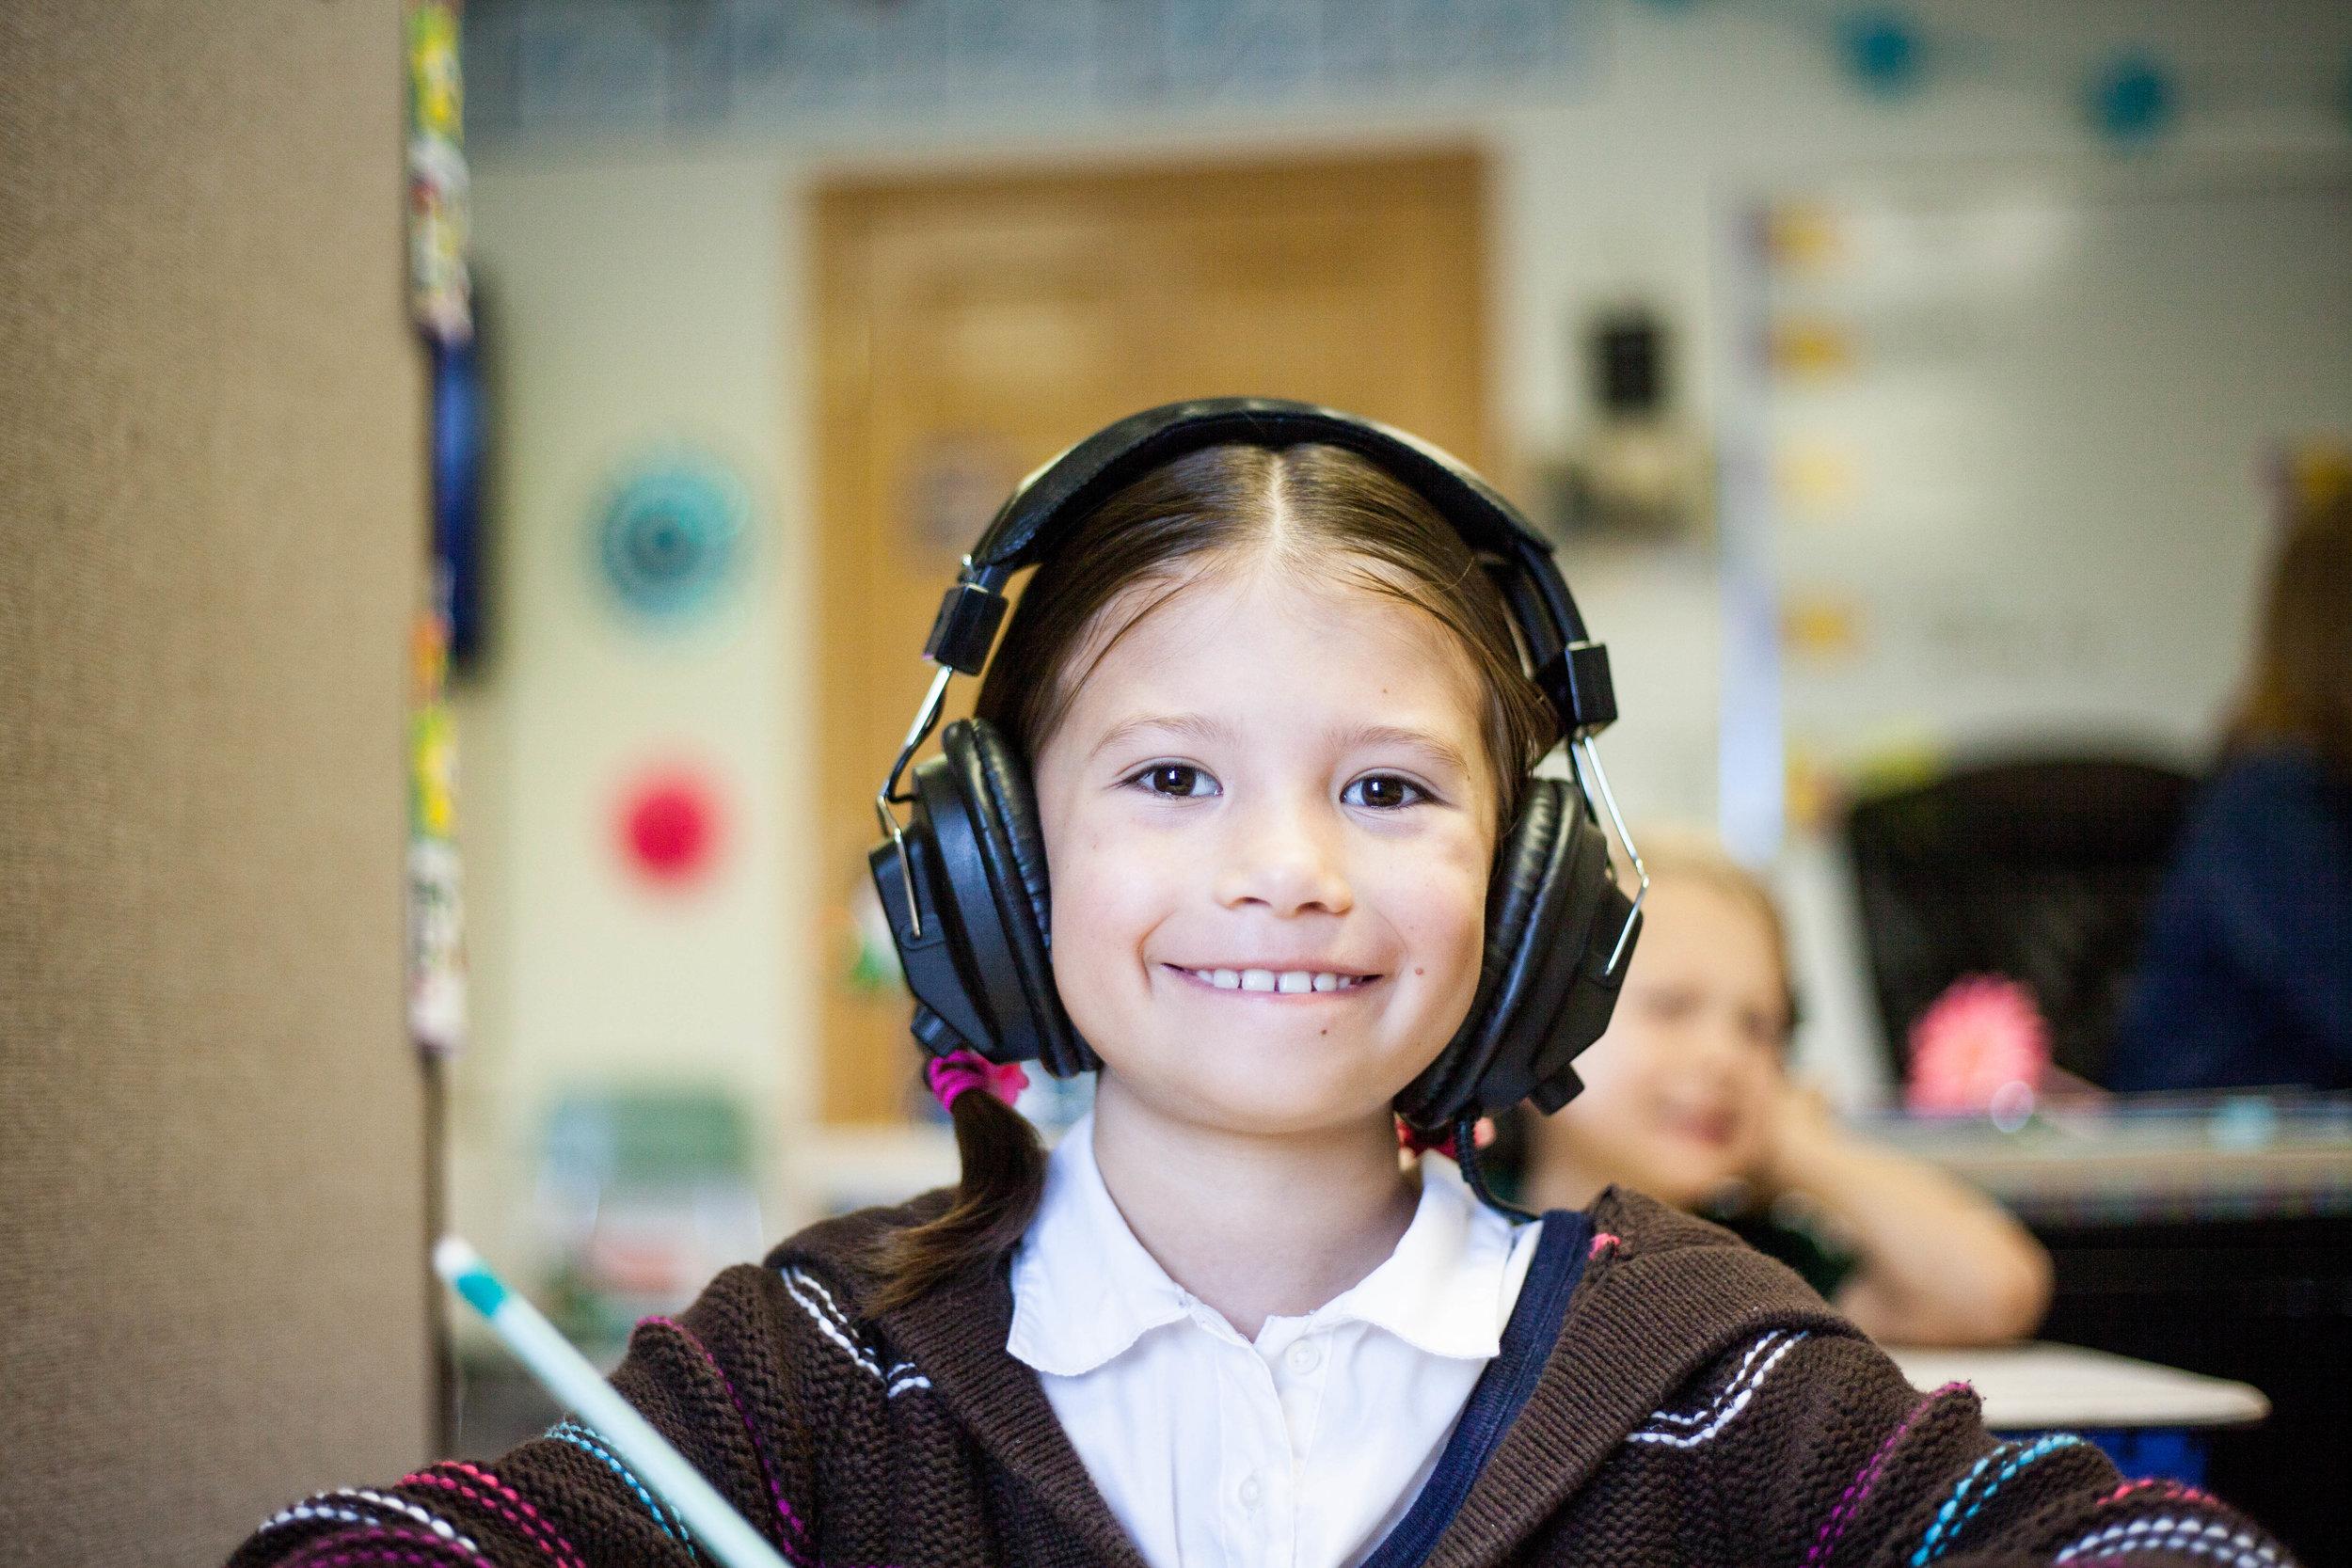 Explore our 4 core values and discover what makes St. Austin Catholic School unique -